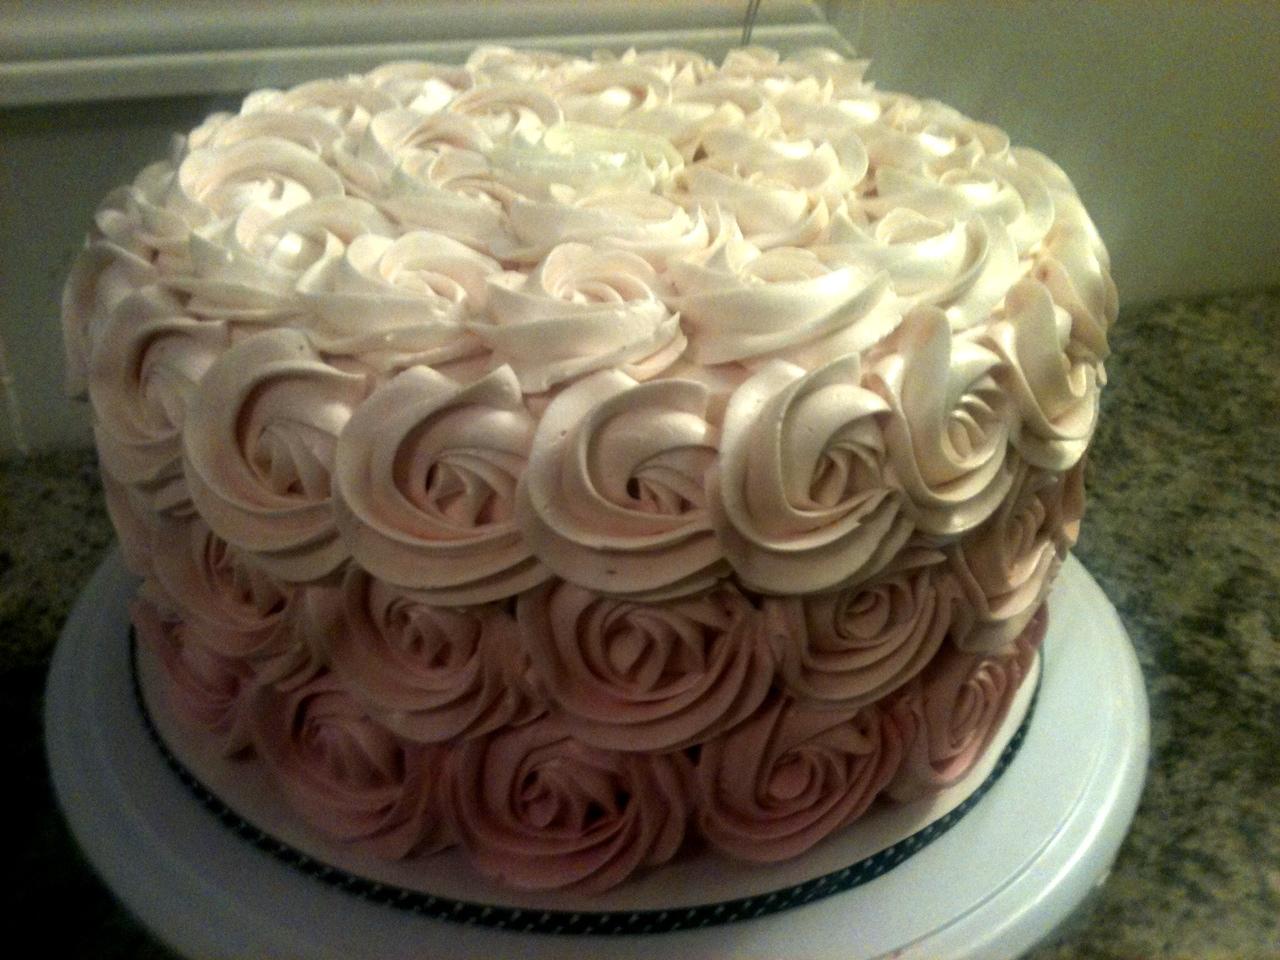 Cake With Roses Buttercream : Sweet Treats by Jen: Buttercream Rose Cake